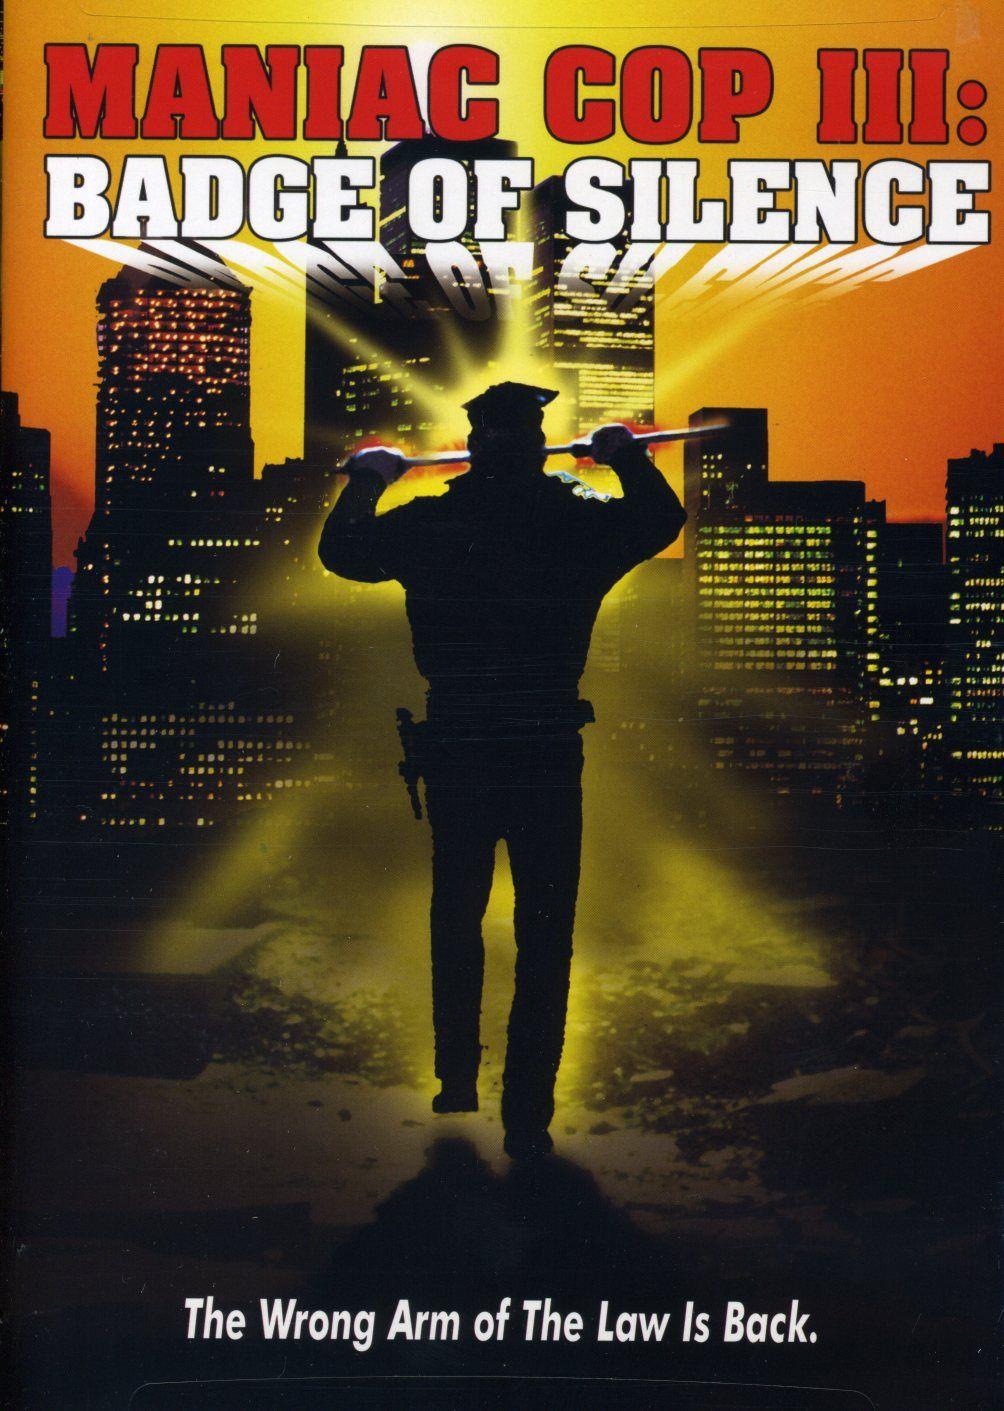 Maniac Cop 3 Badge Of Silence Maniac cop, Cop, Film 1990